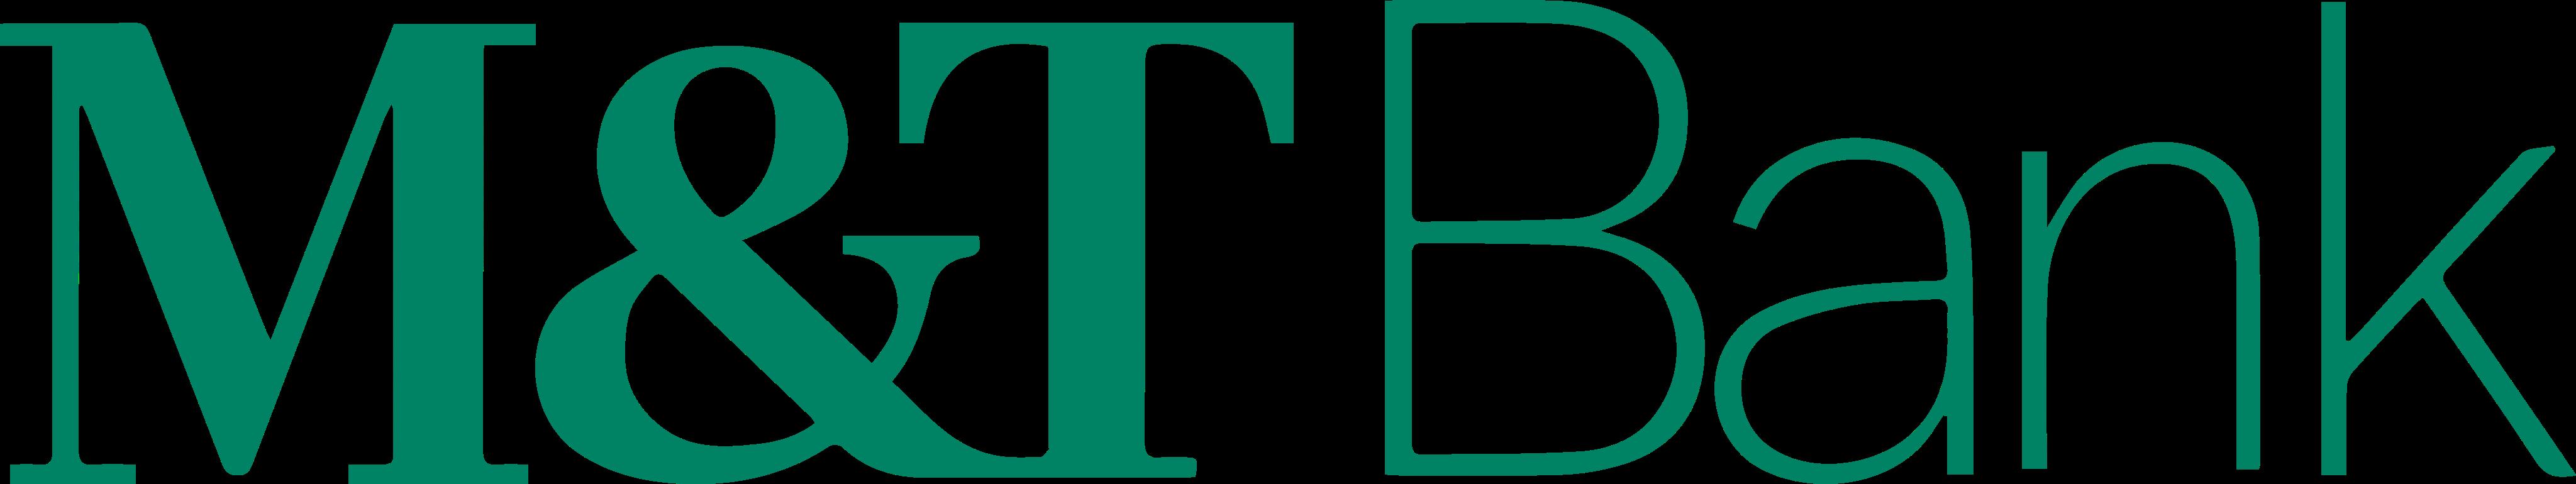 mt bank logo - M&T Bank Logo